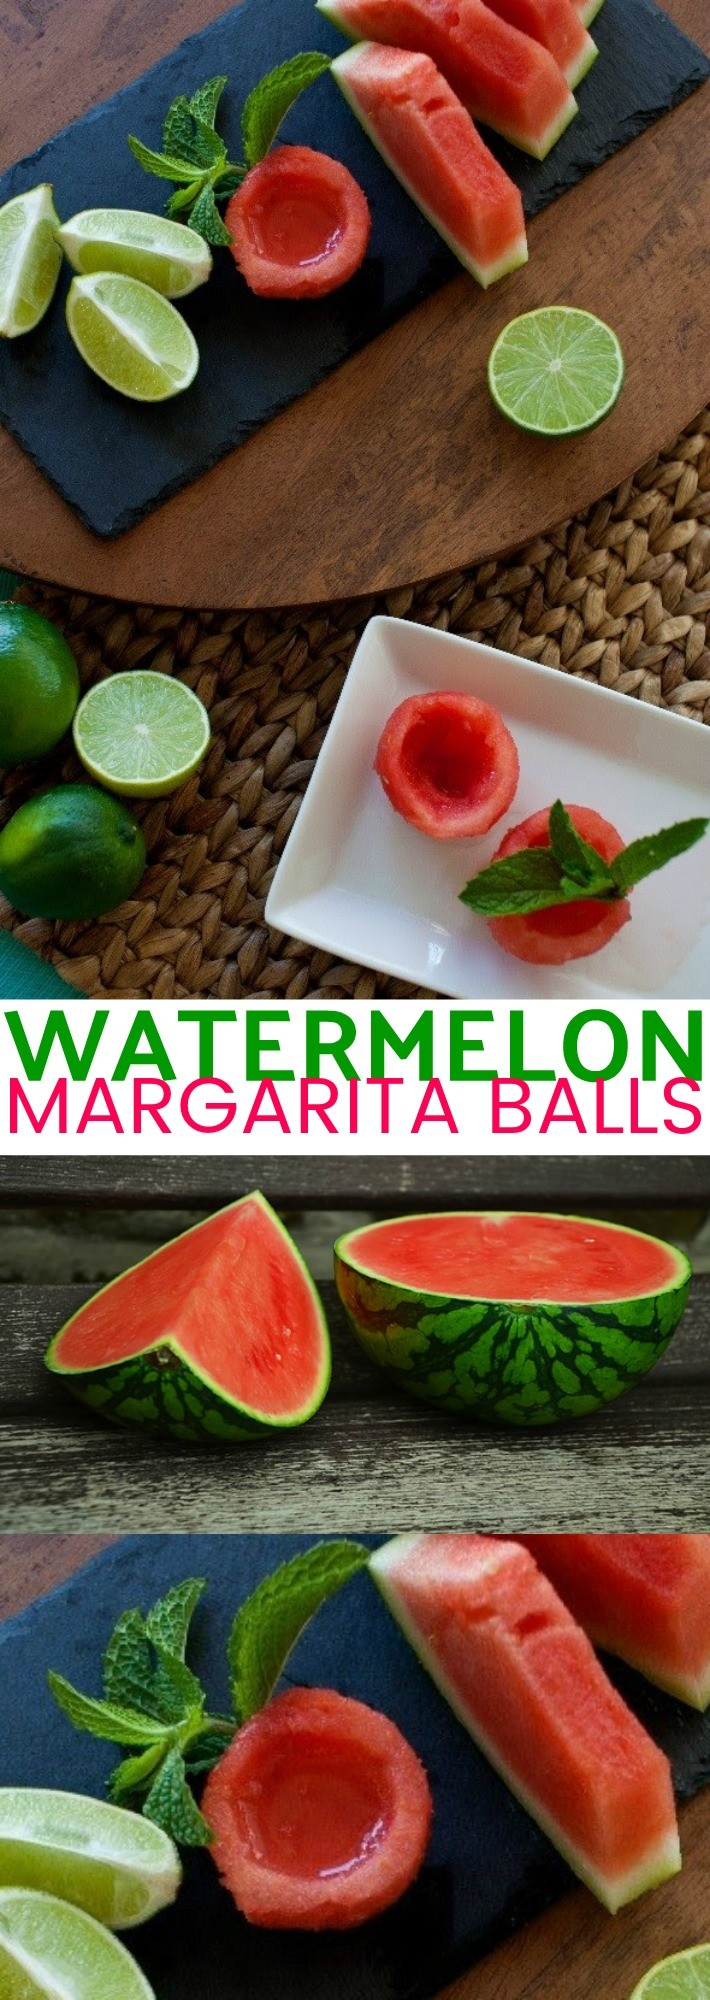 Watermelon Margarita Balls Are My New Favorite Watermelon Cocktail!